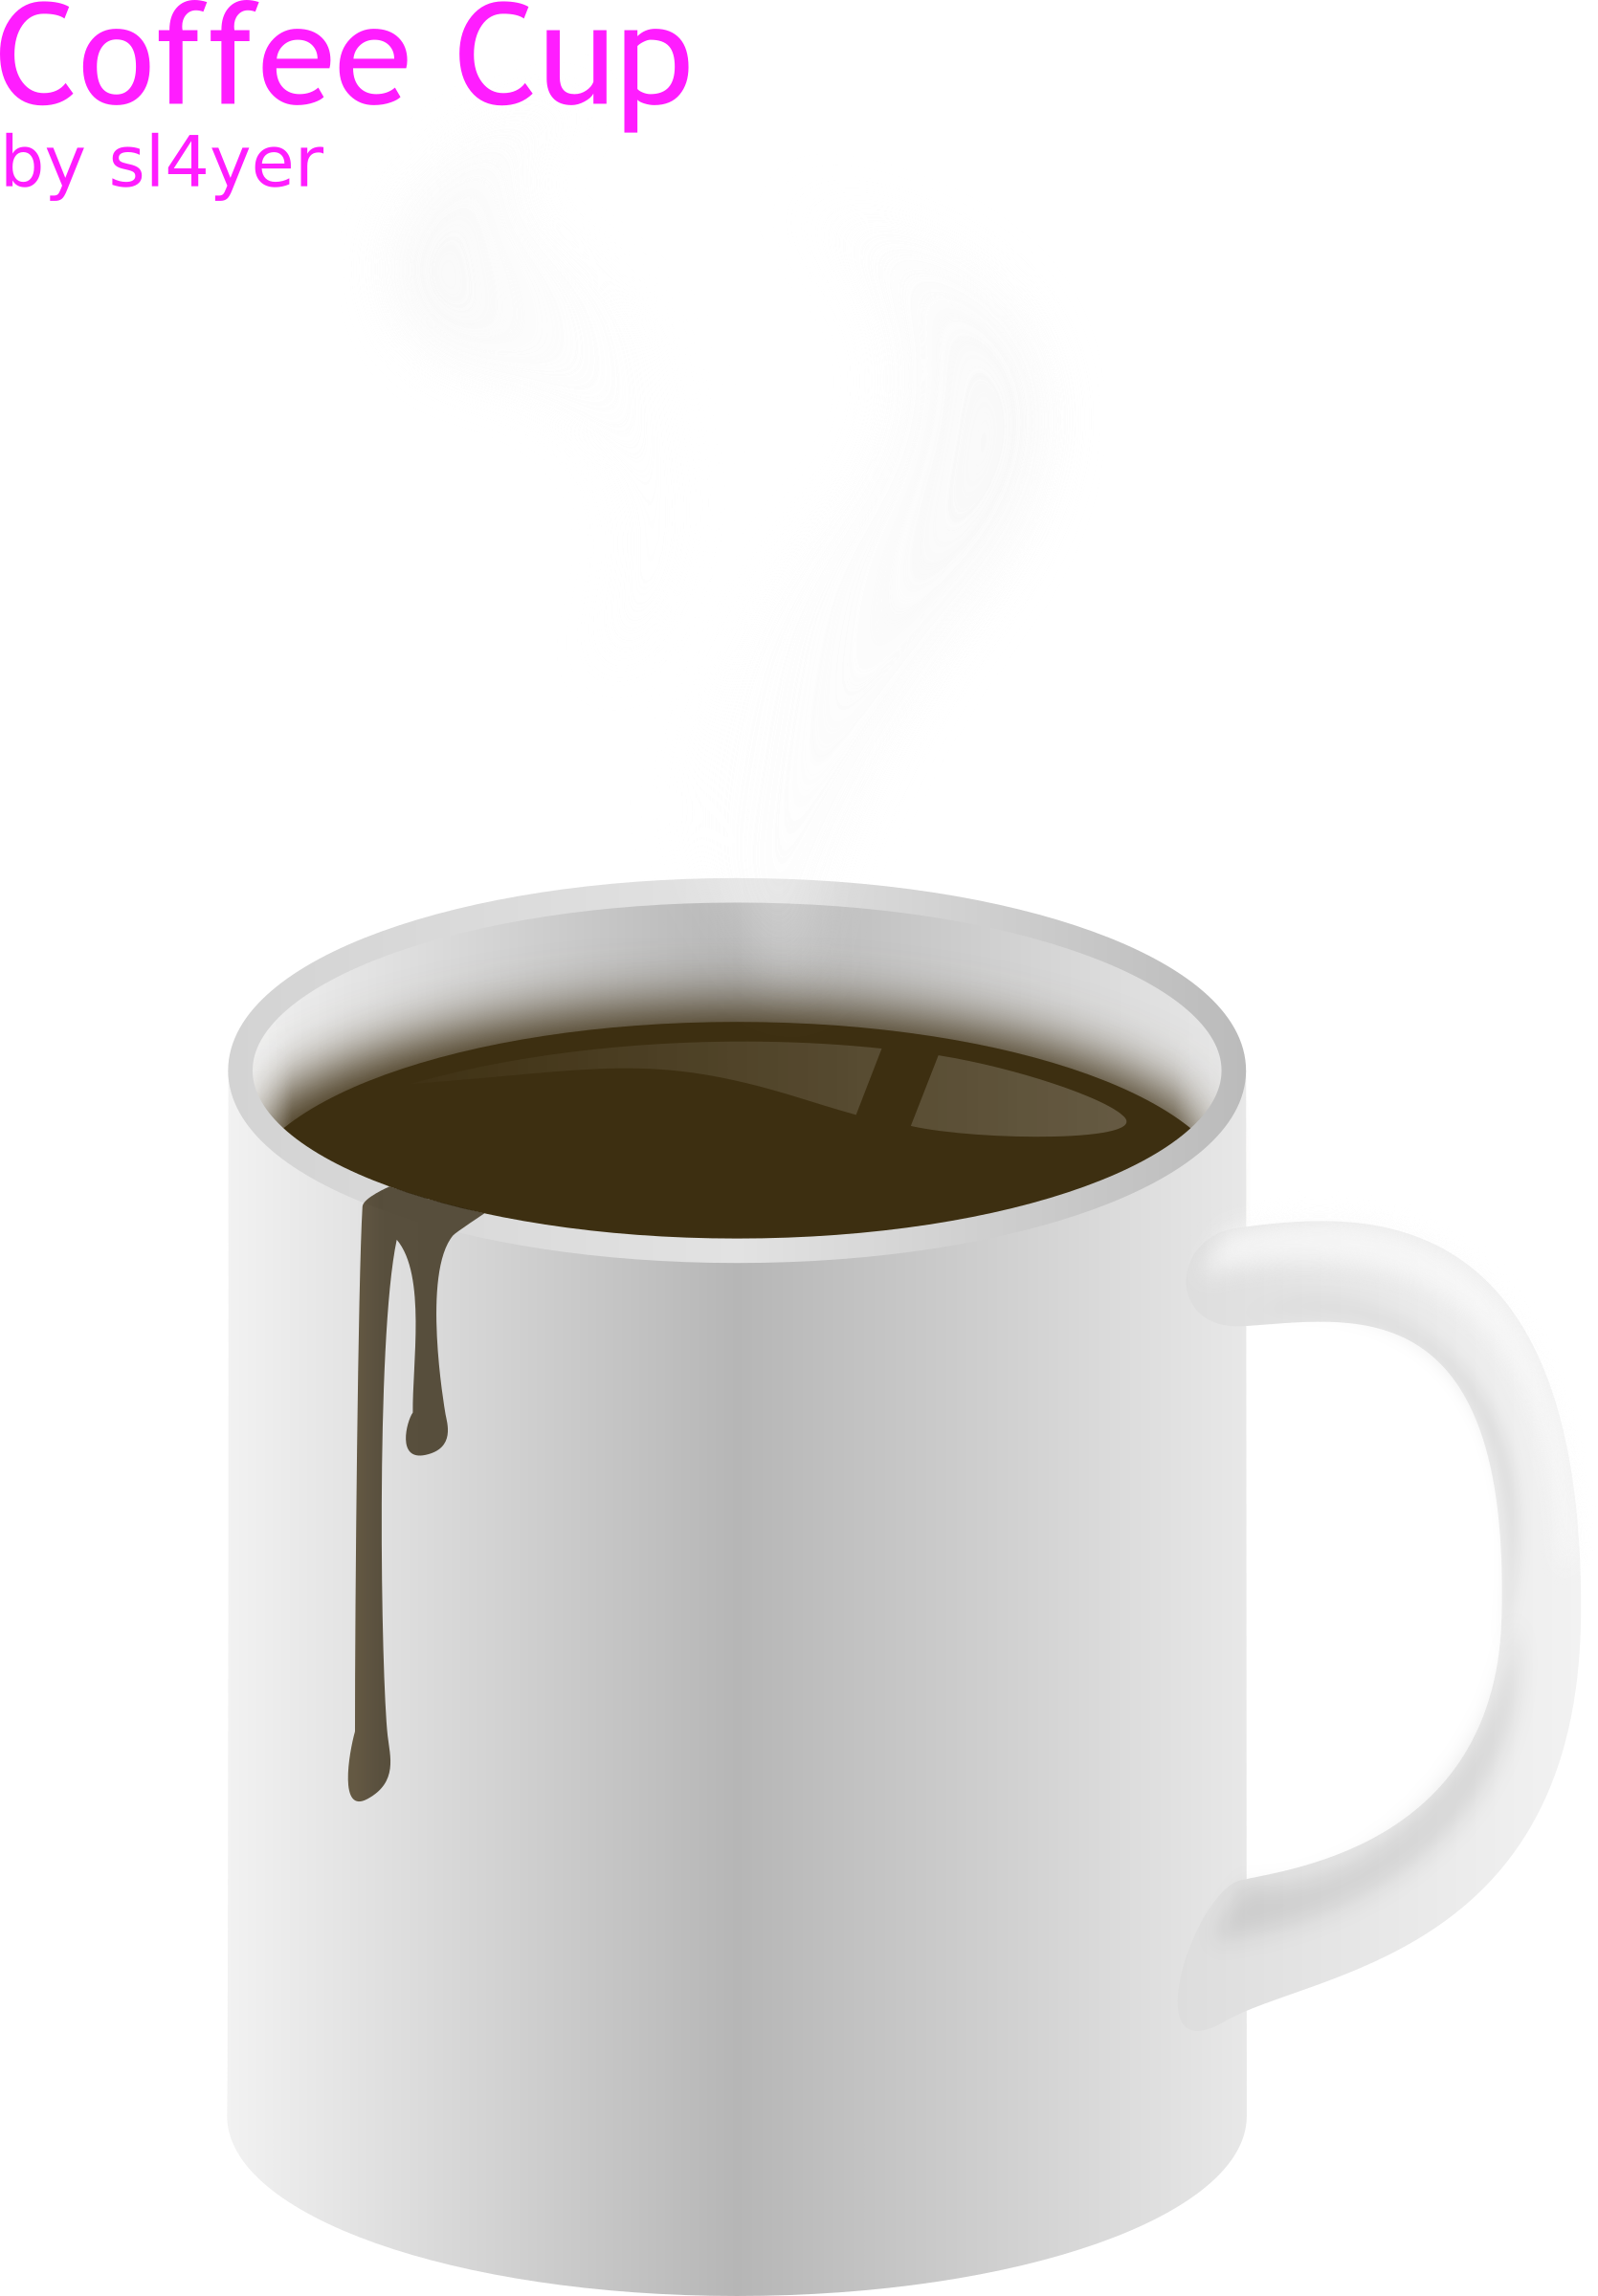 Cup clipart brown coffee mug. Big image png